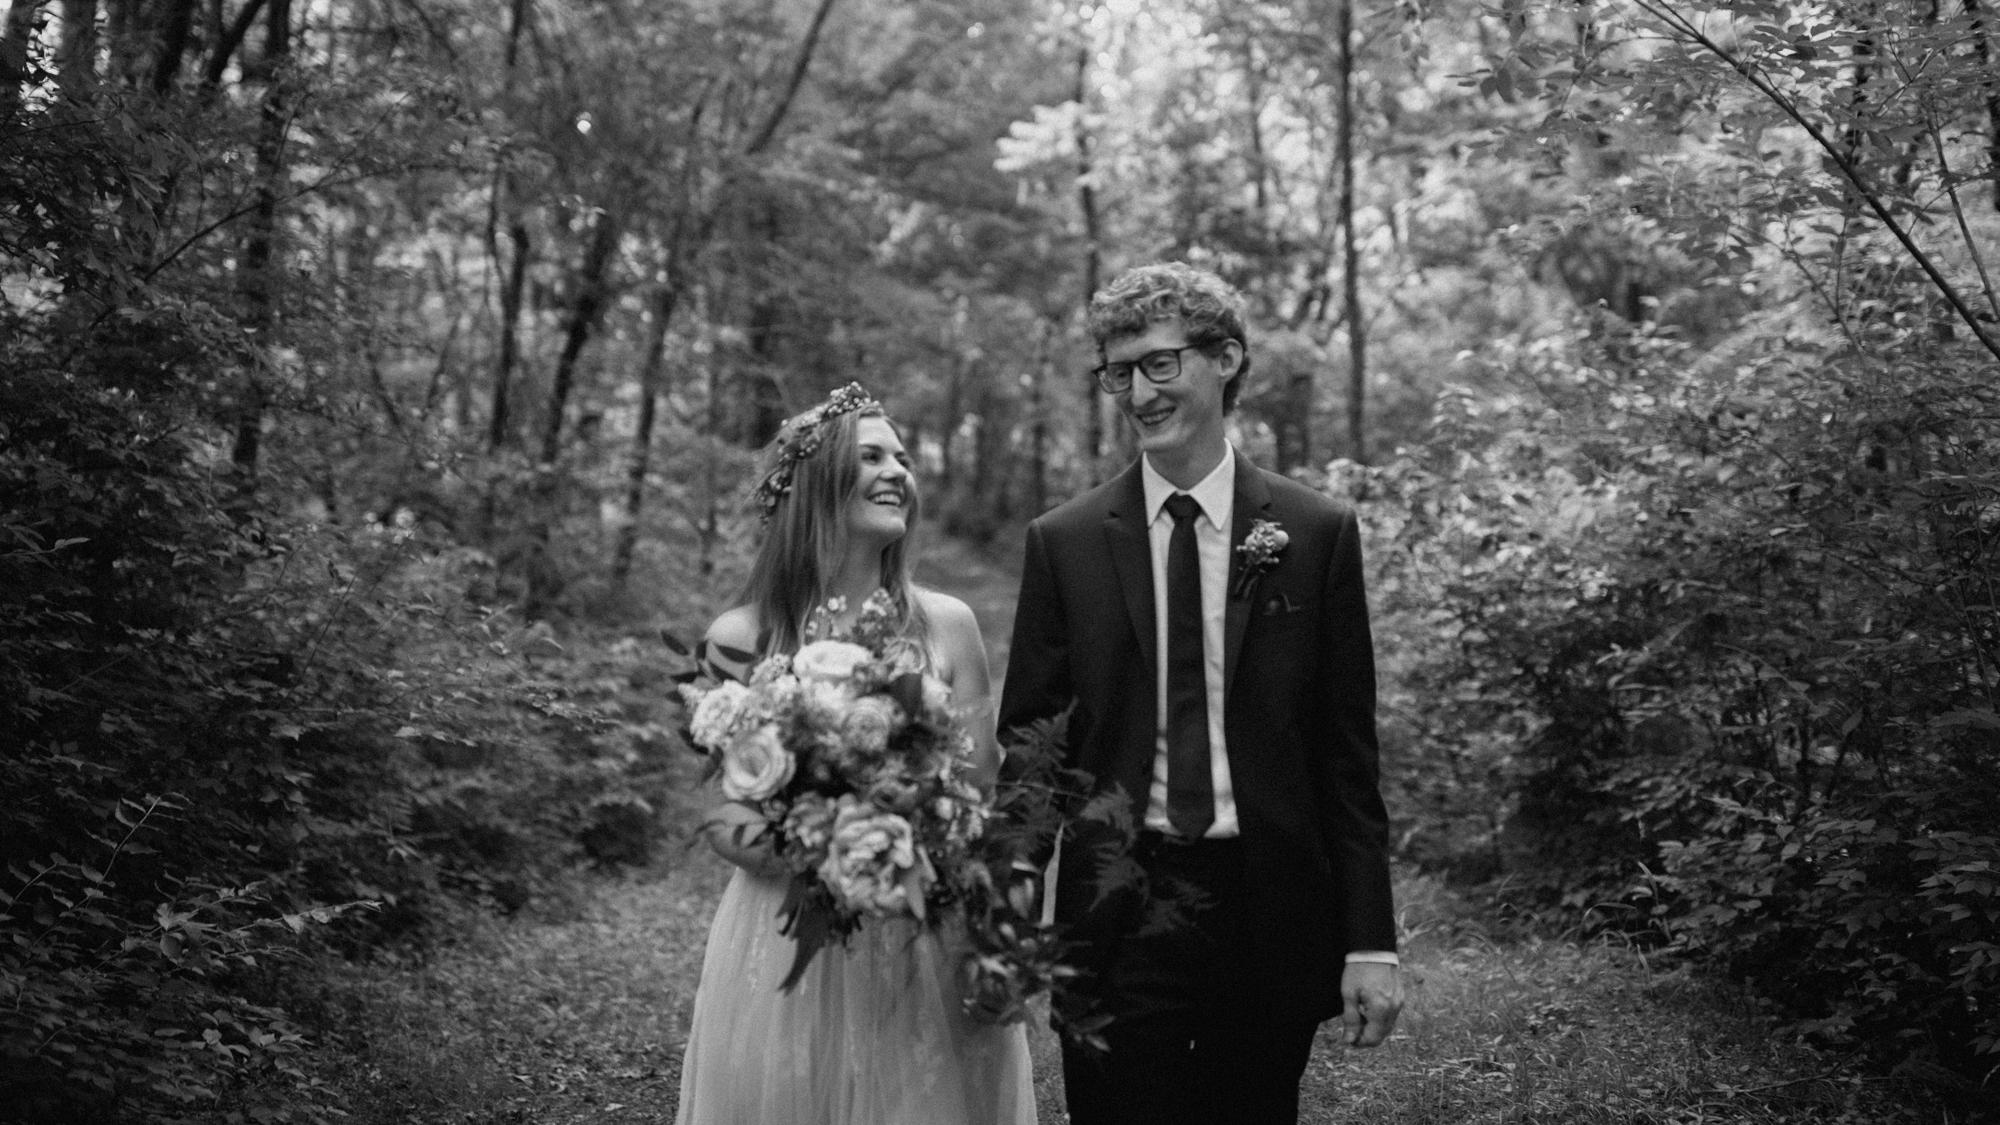 alec_vanderboom_kansas_city_mo_wedding_photos-0089.jpg